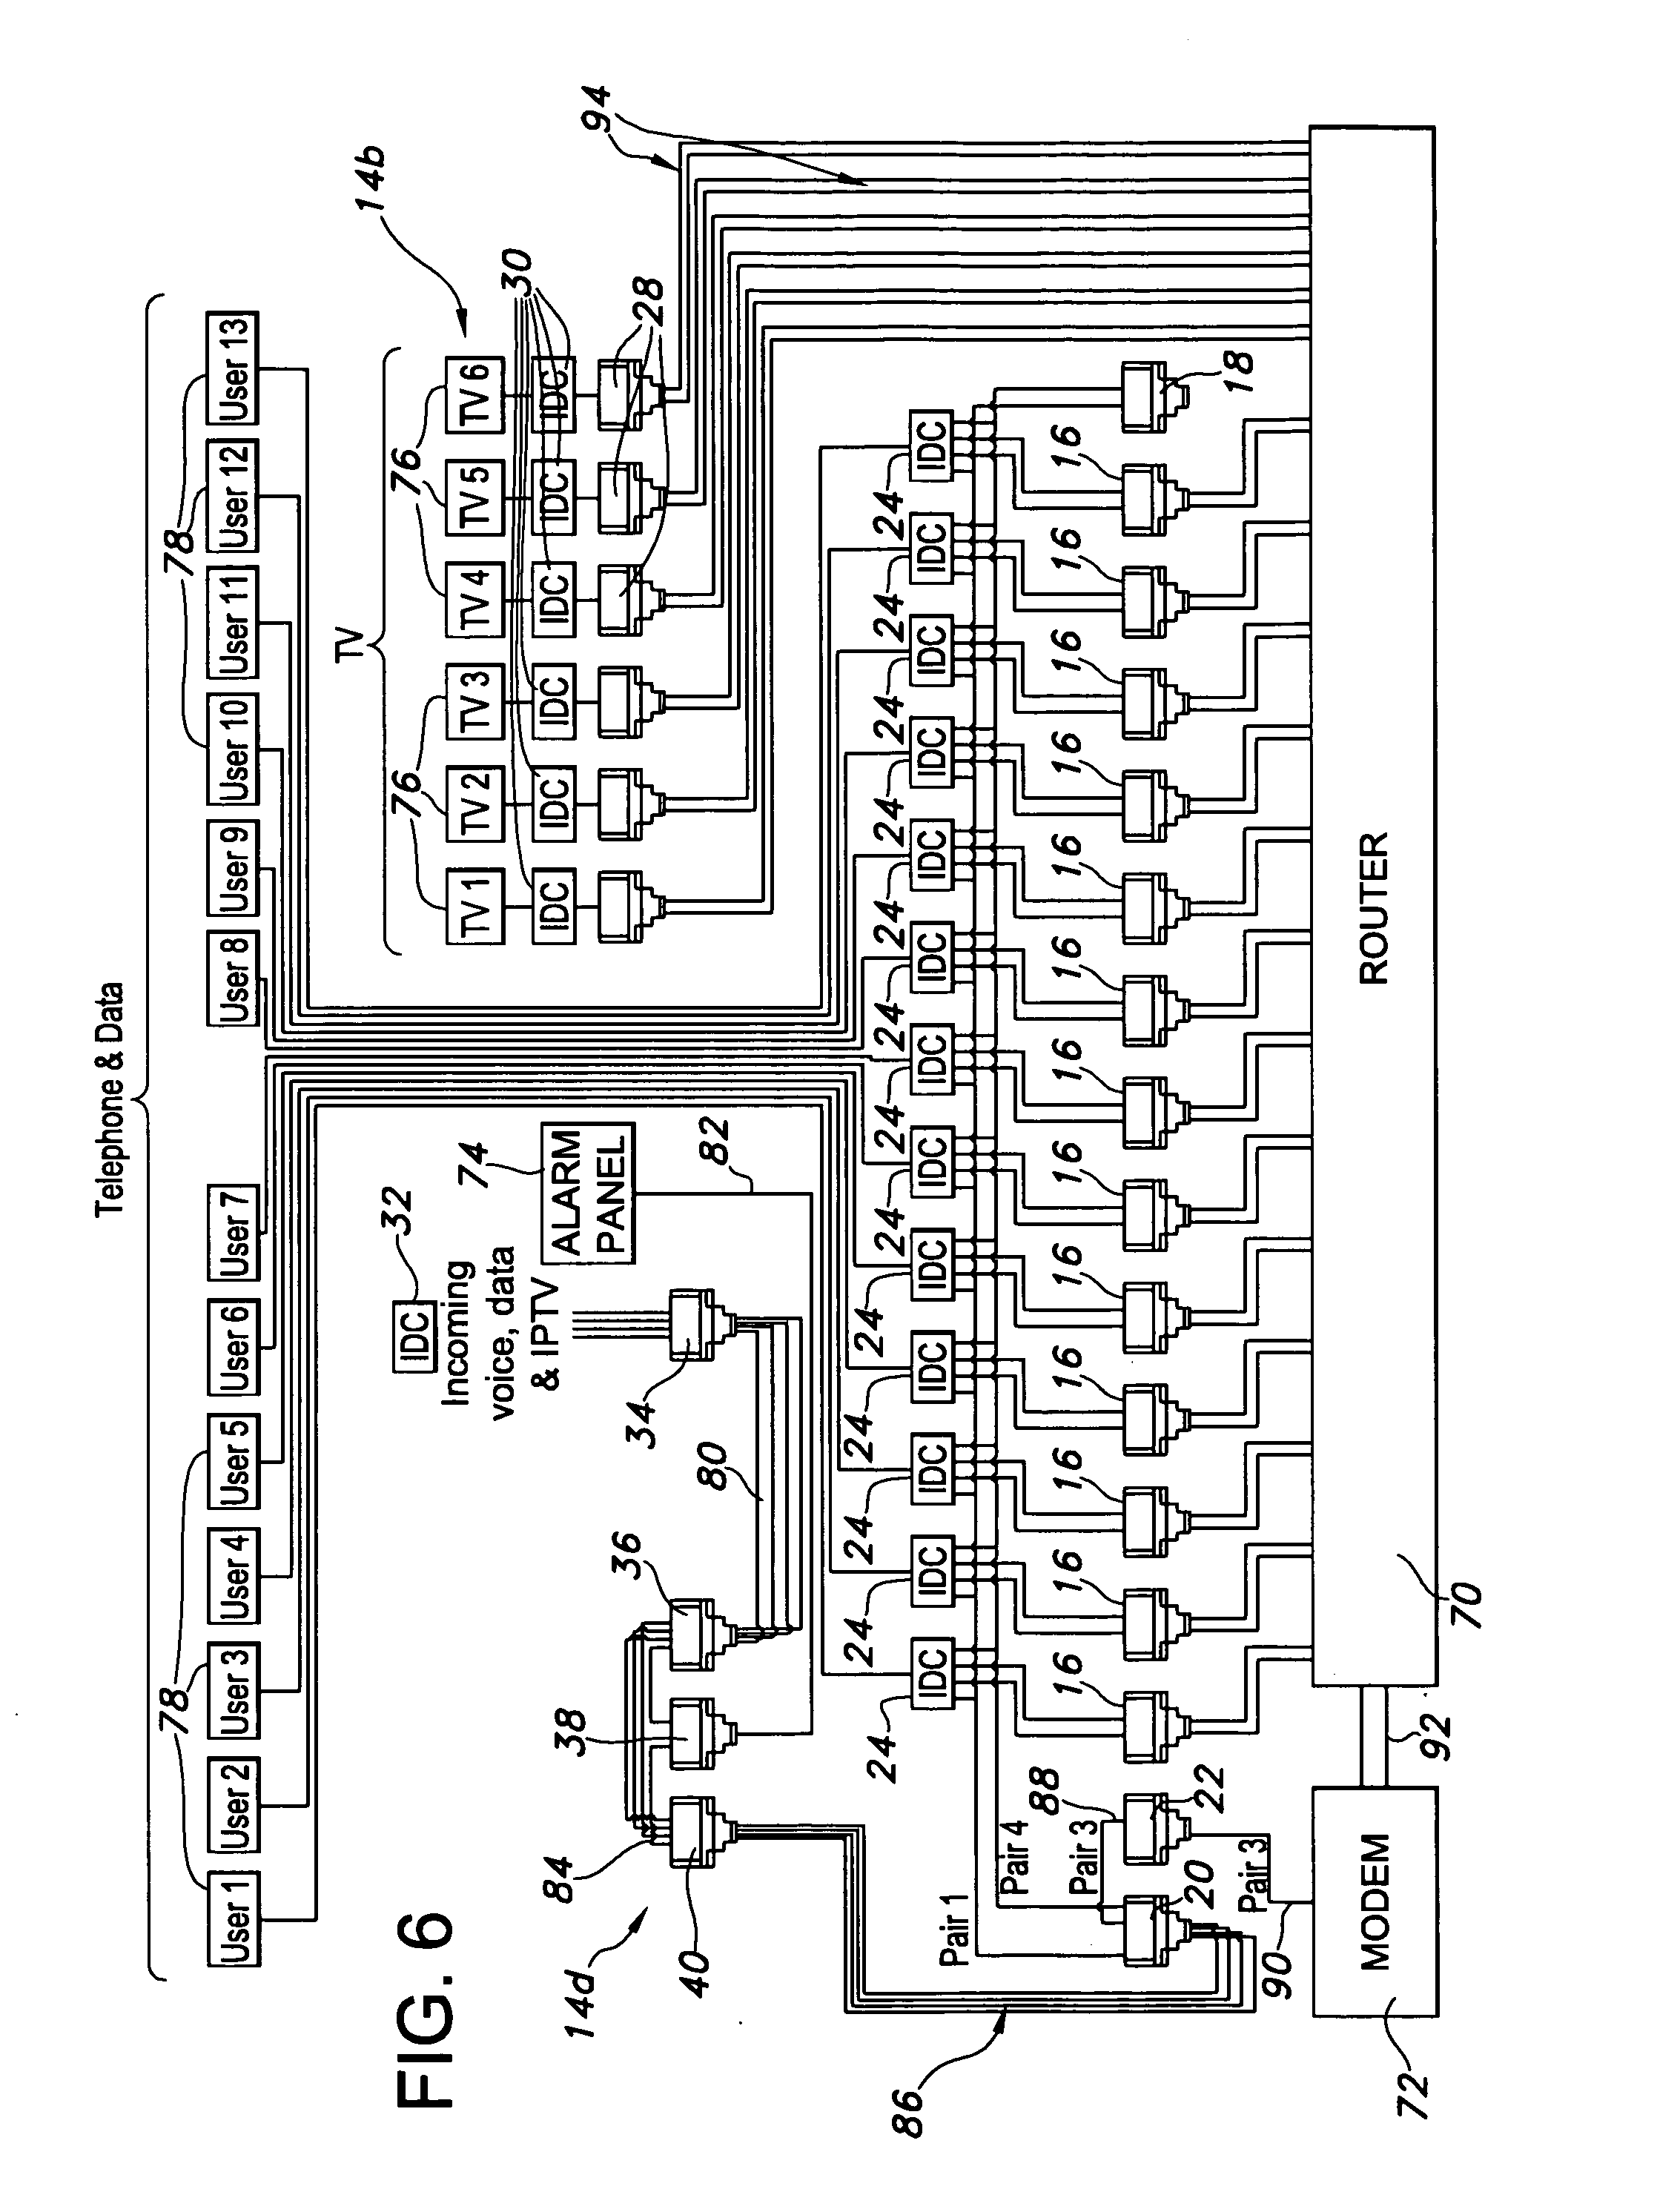 Ethernet Plug Wiring Schematic Relay Bridge Diagram Standard On Radio Standards